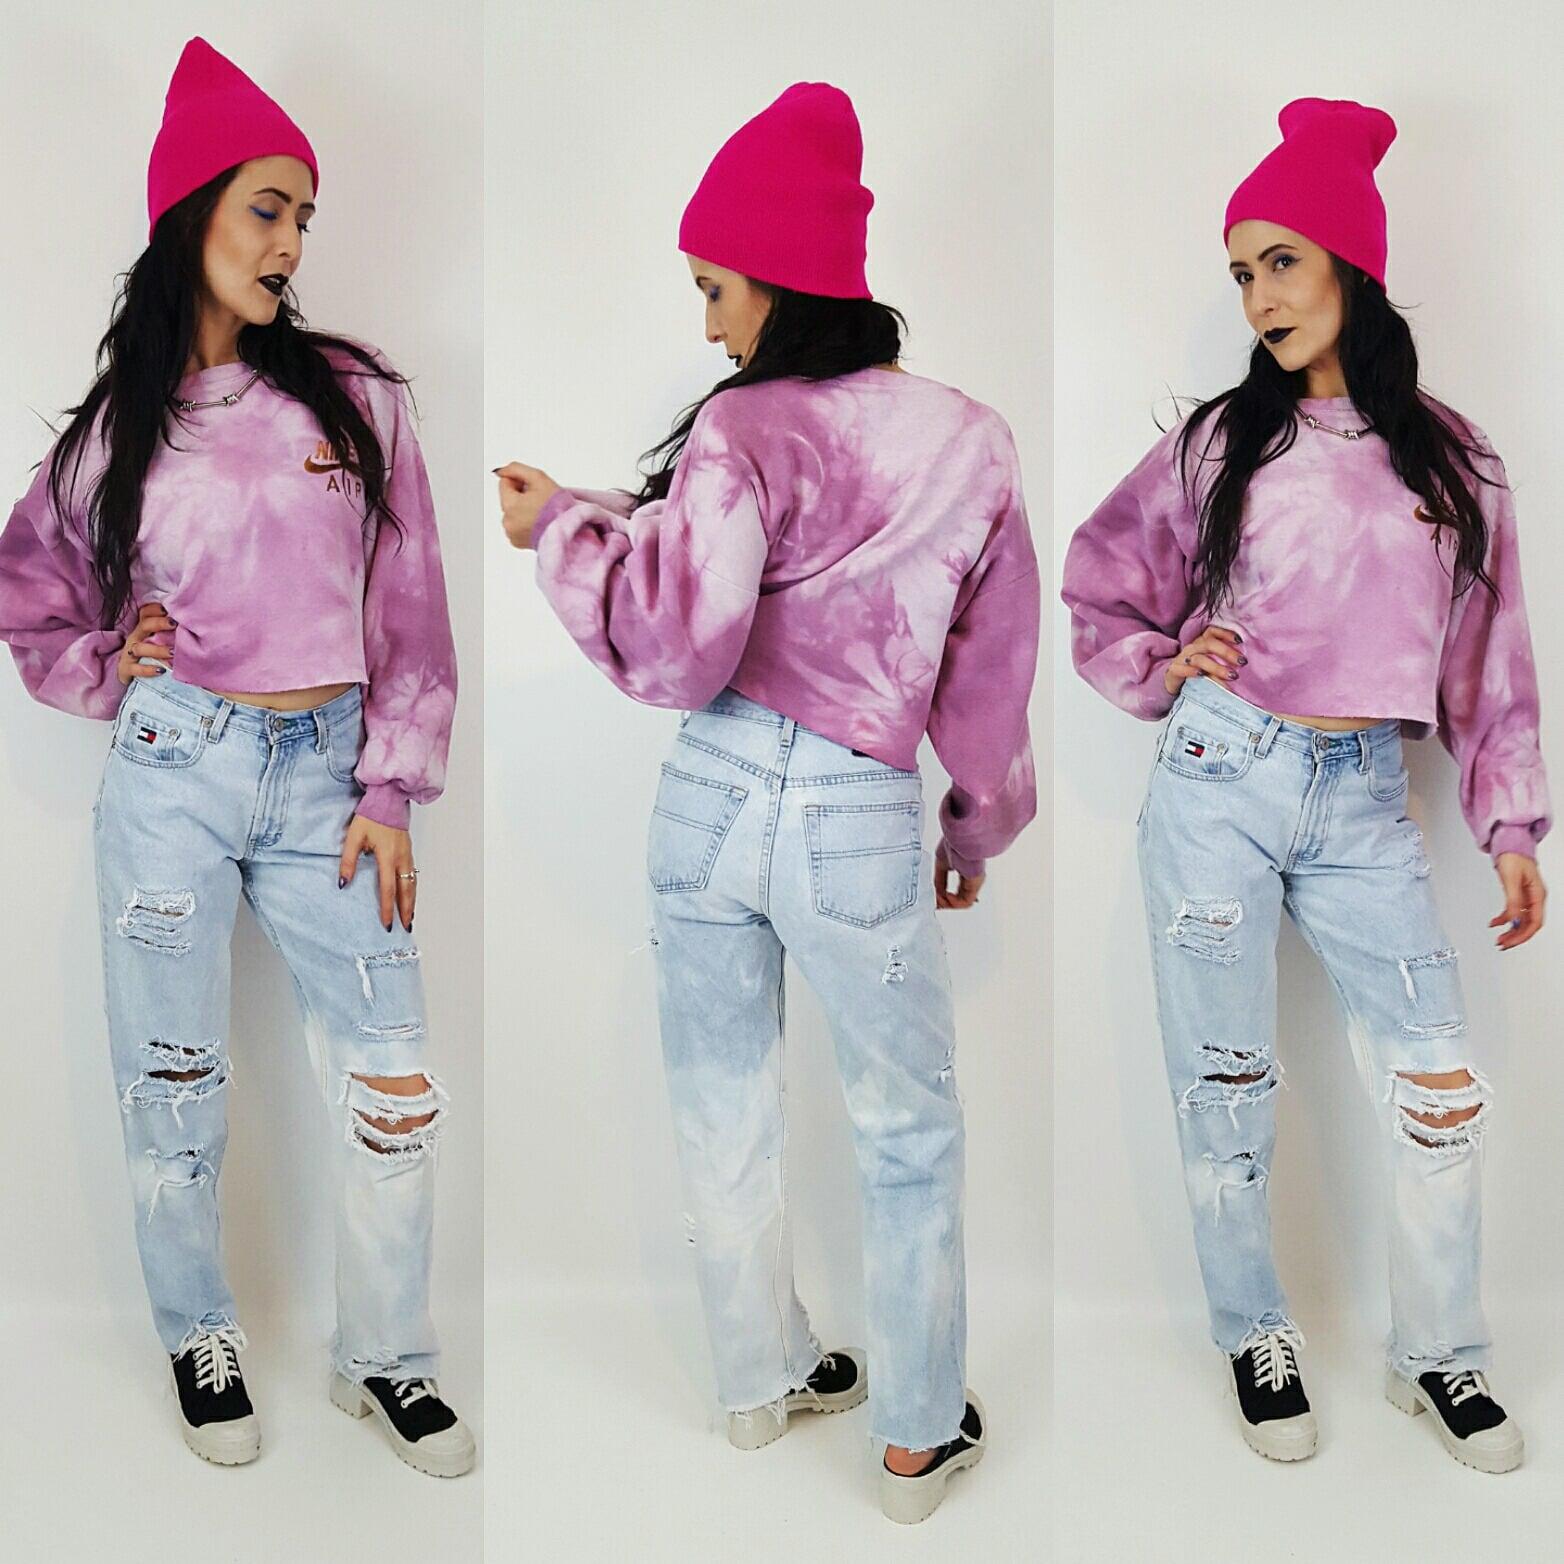 c35480403029e Nike Pink Tiedye Cropped Sweatshirt - Large Oversized Baggy Crop Top ...